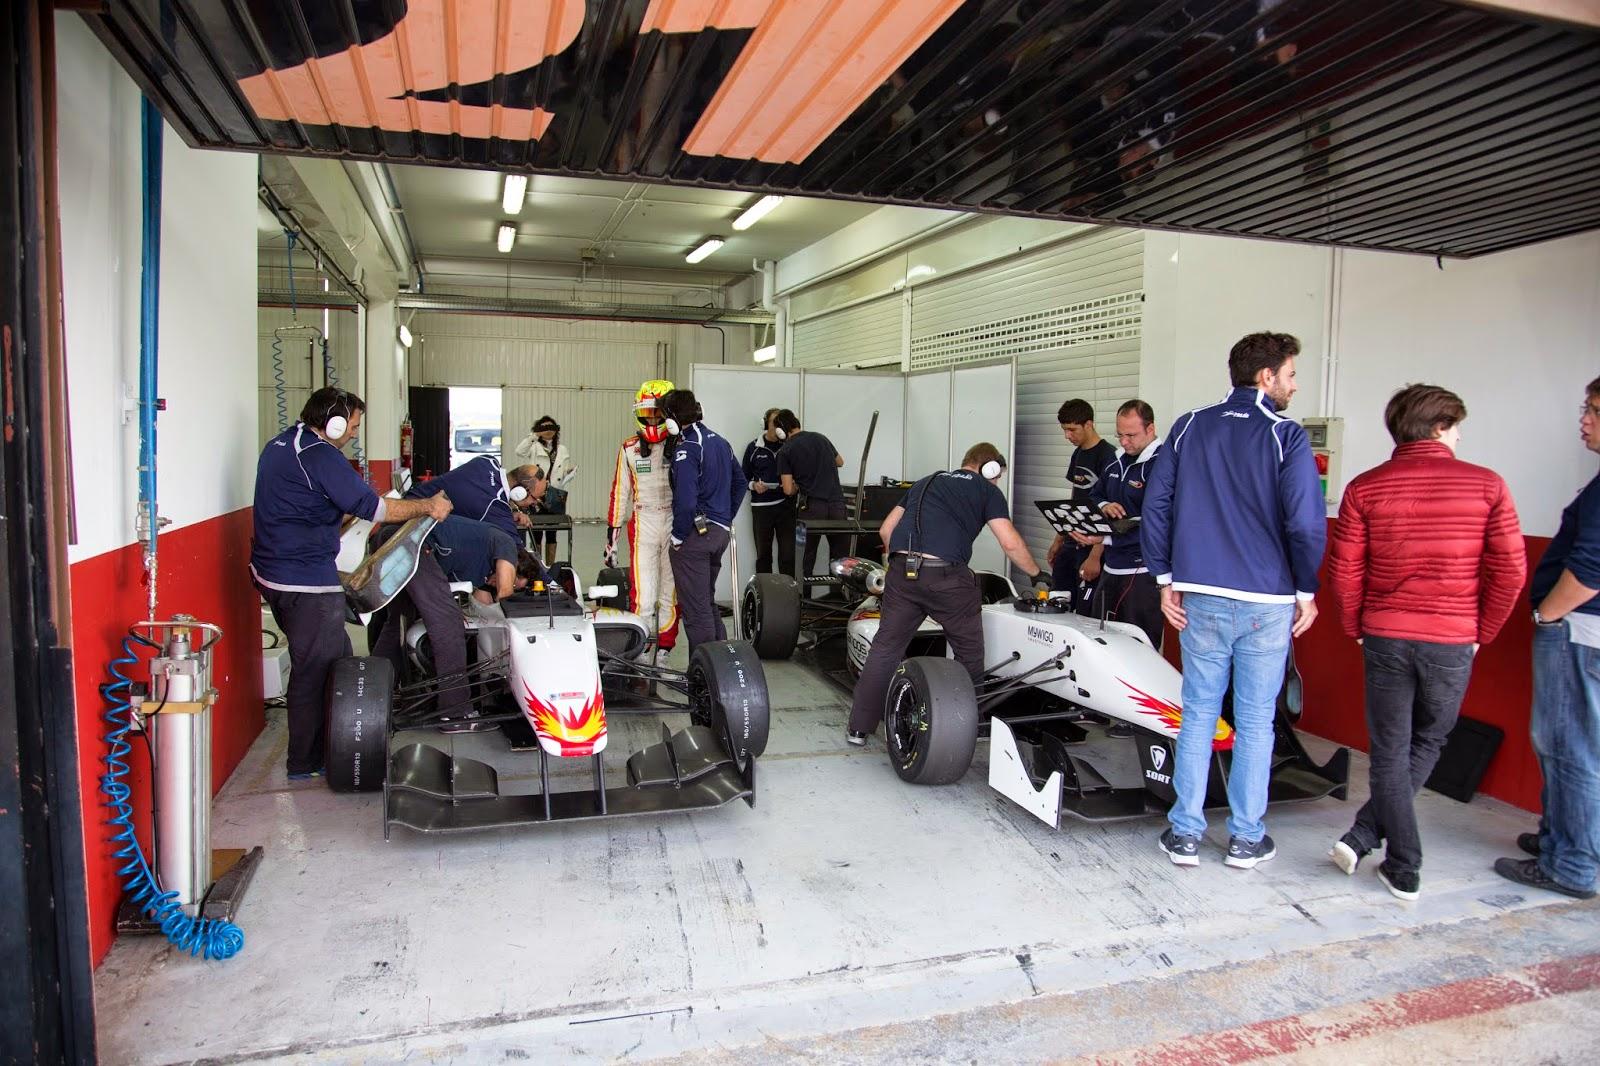 composites, carbon fiber, CFRP, F3, F1, EuroFormula Open